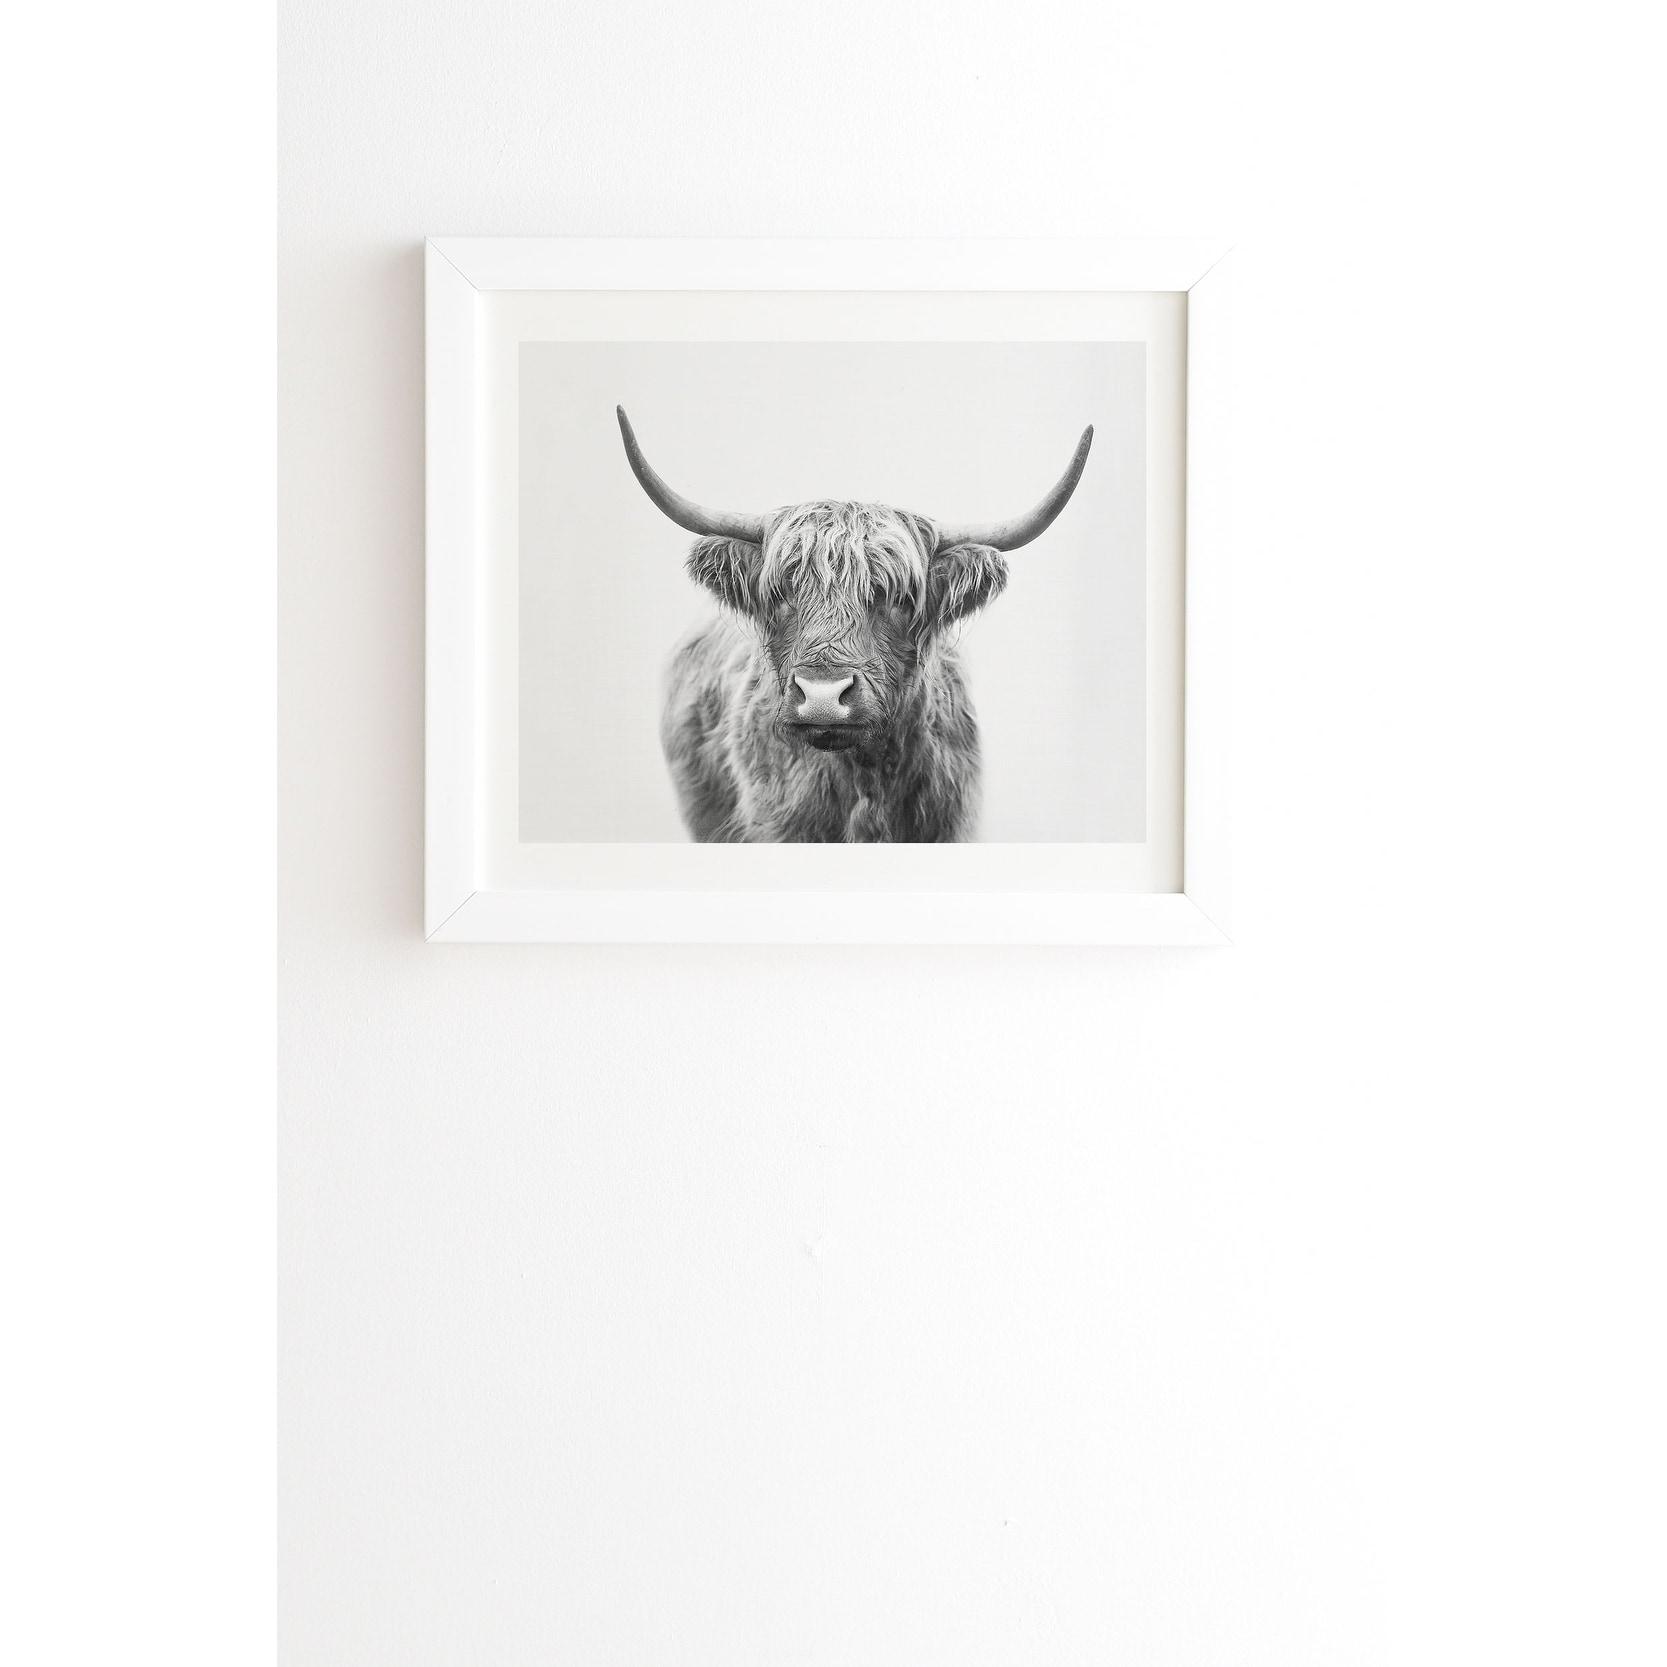 Deny Designs Highland Bull Framed Wall Art 3 Frame Colors Grey Overstock 27177518